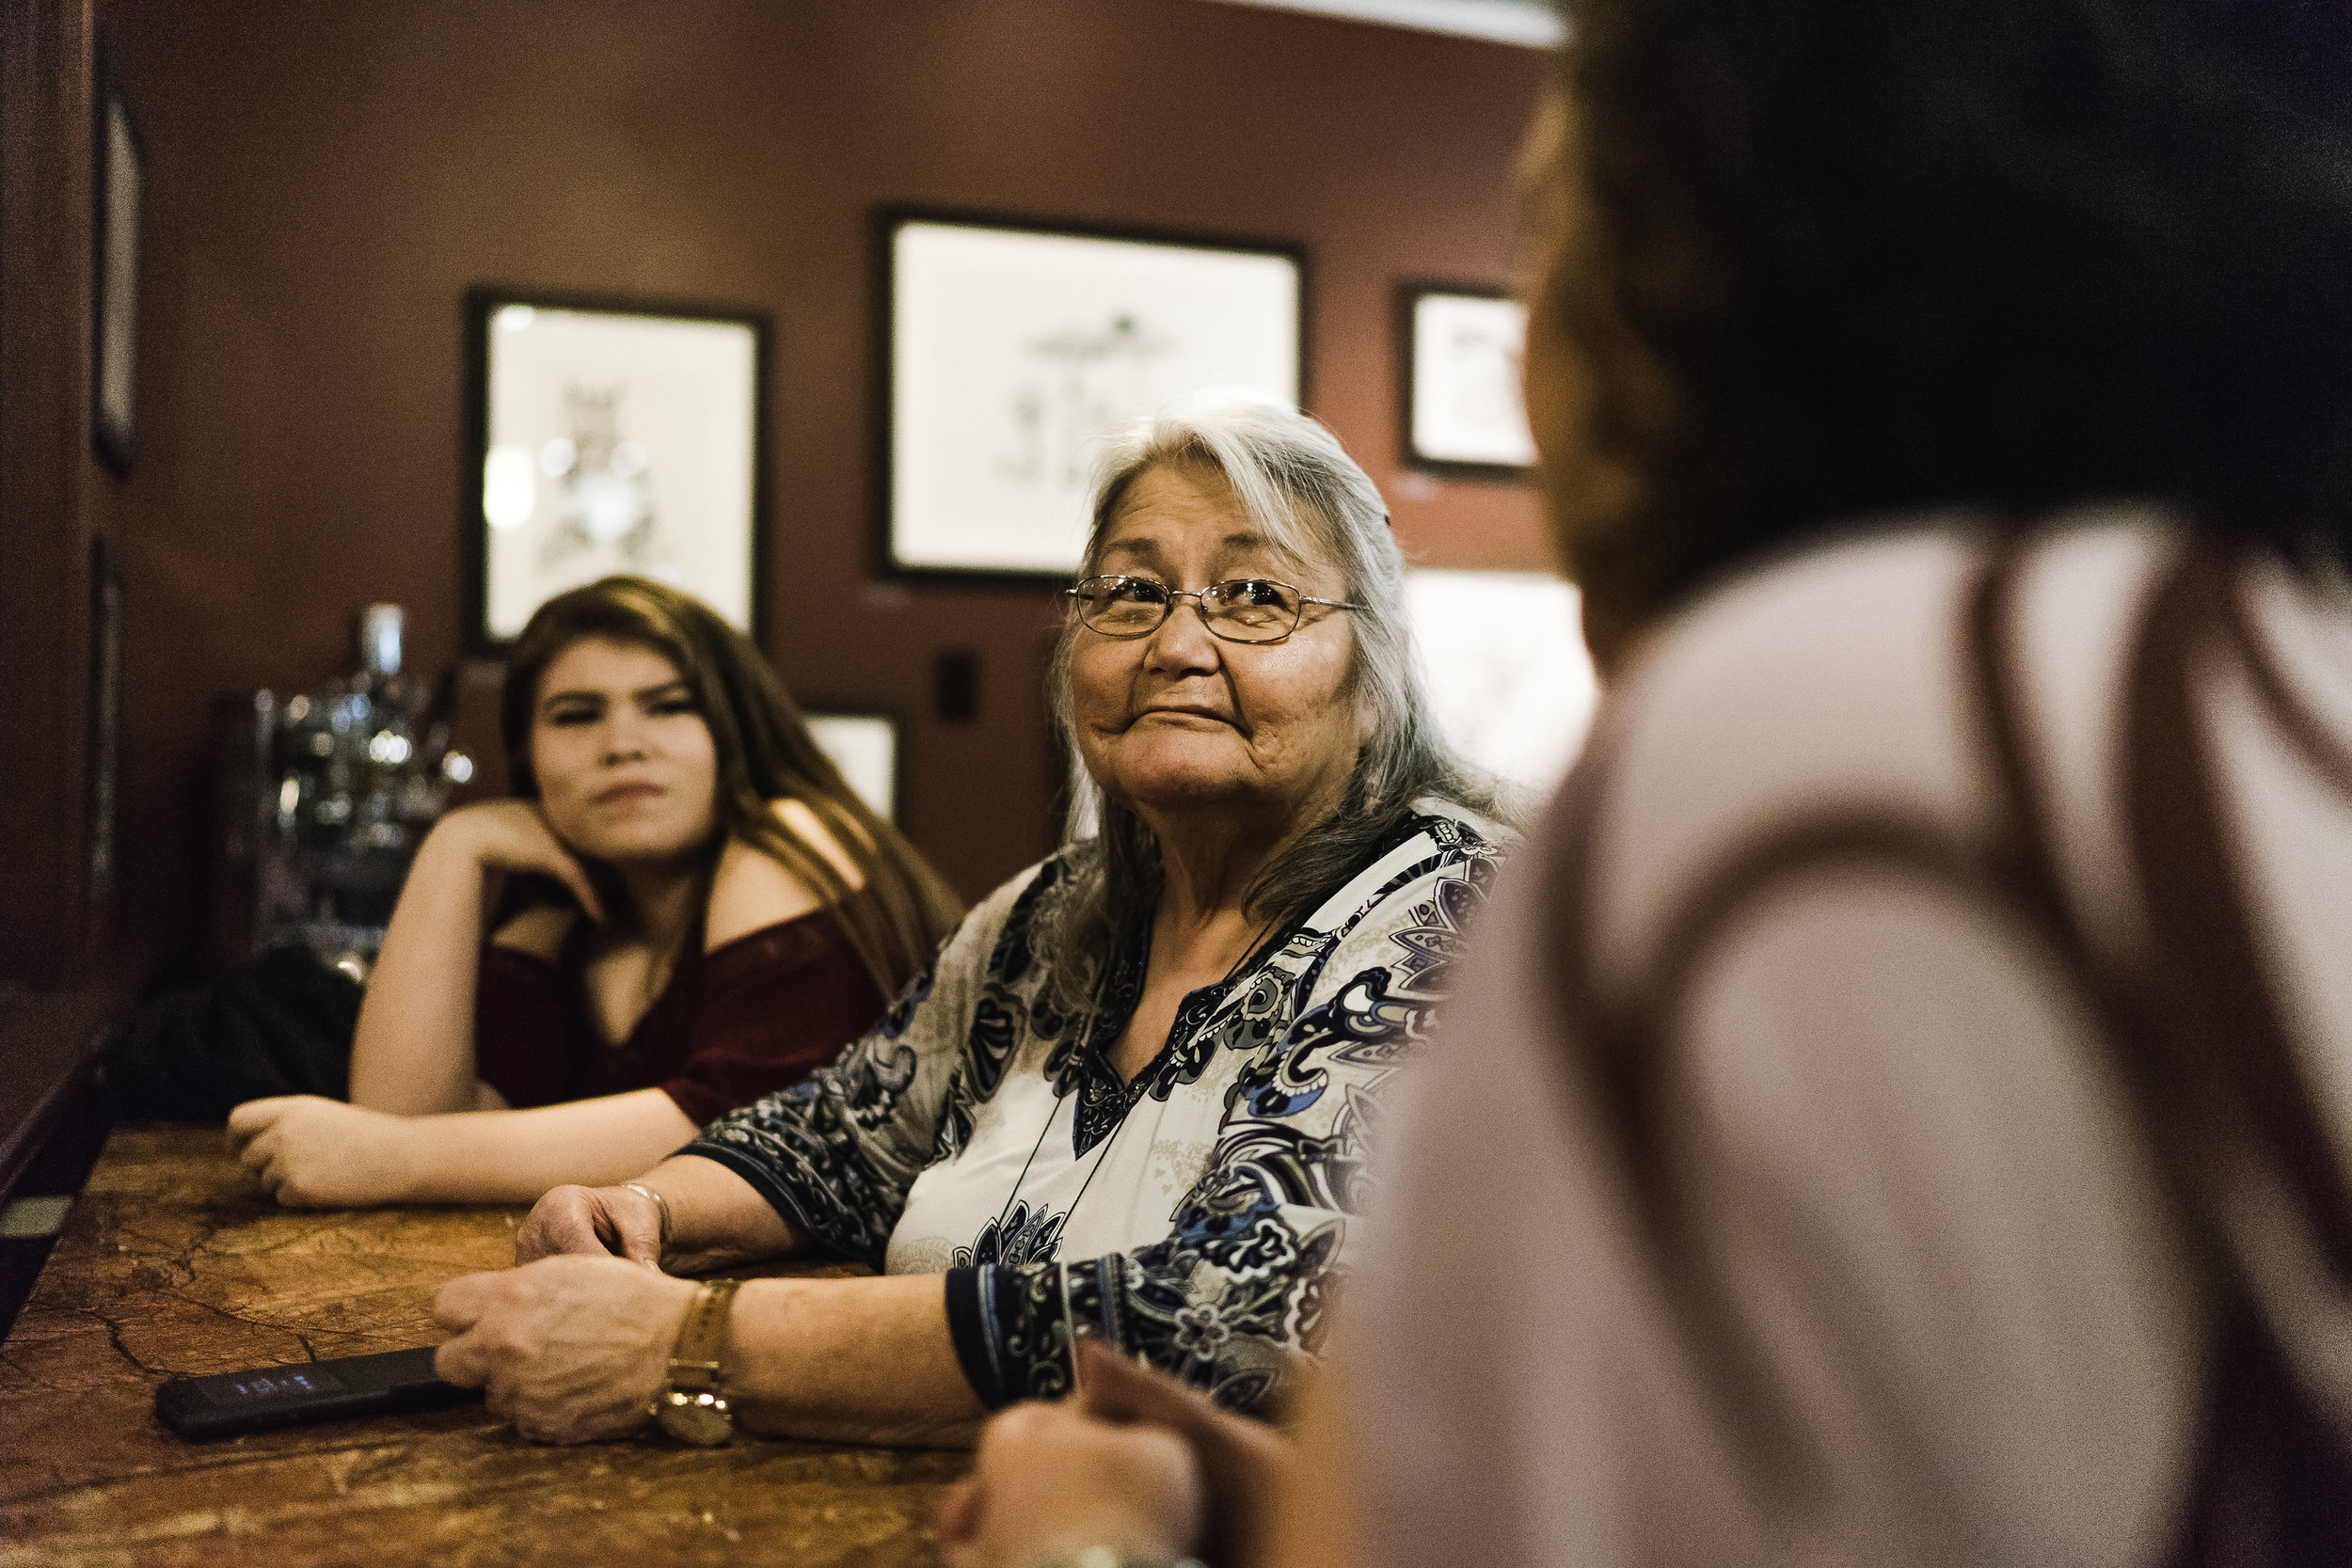 TONL-05022 - elderly native woman.jpg